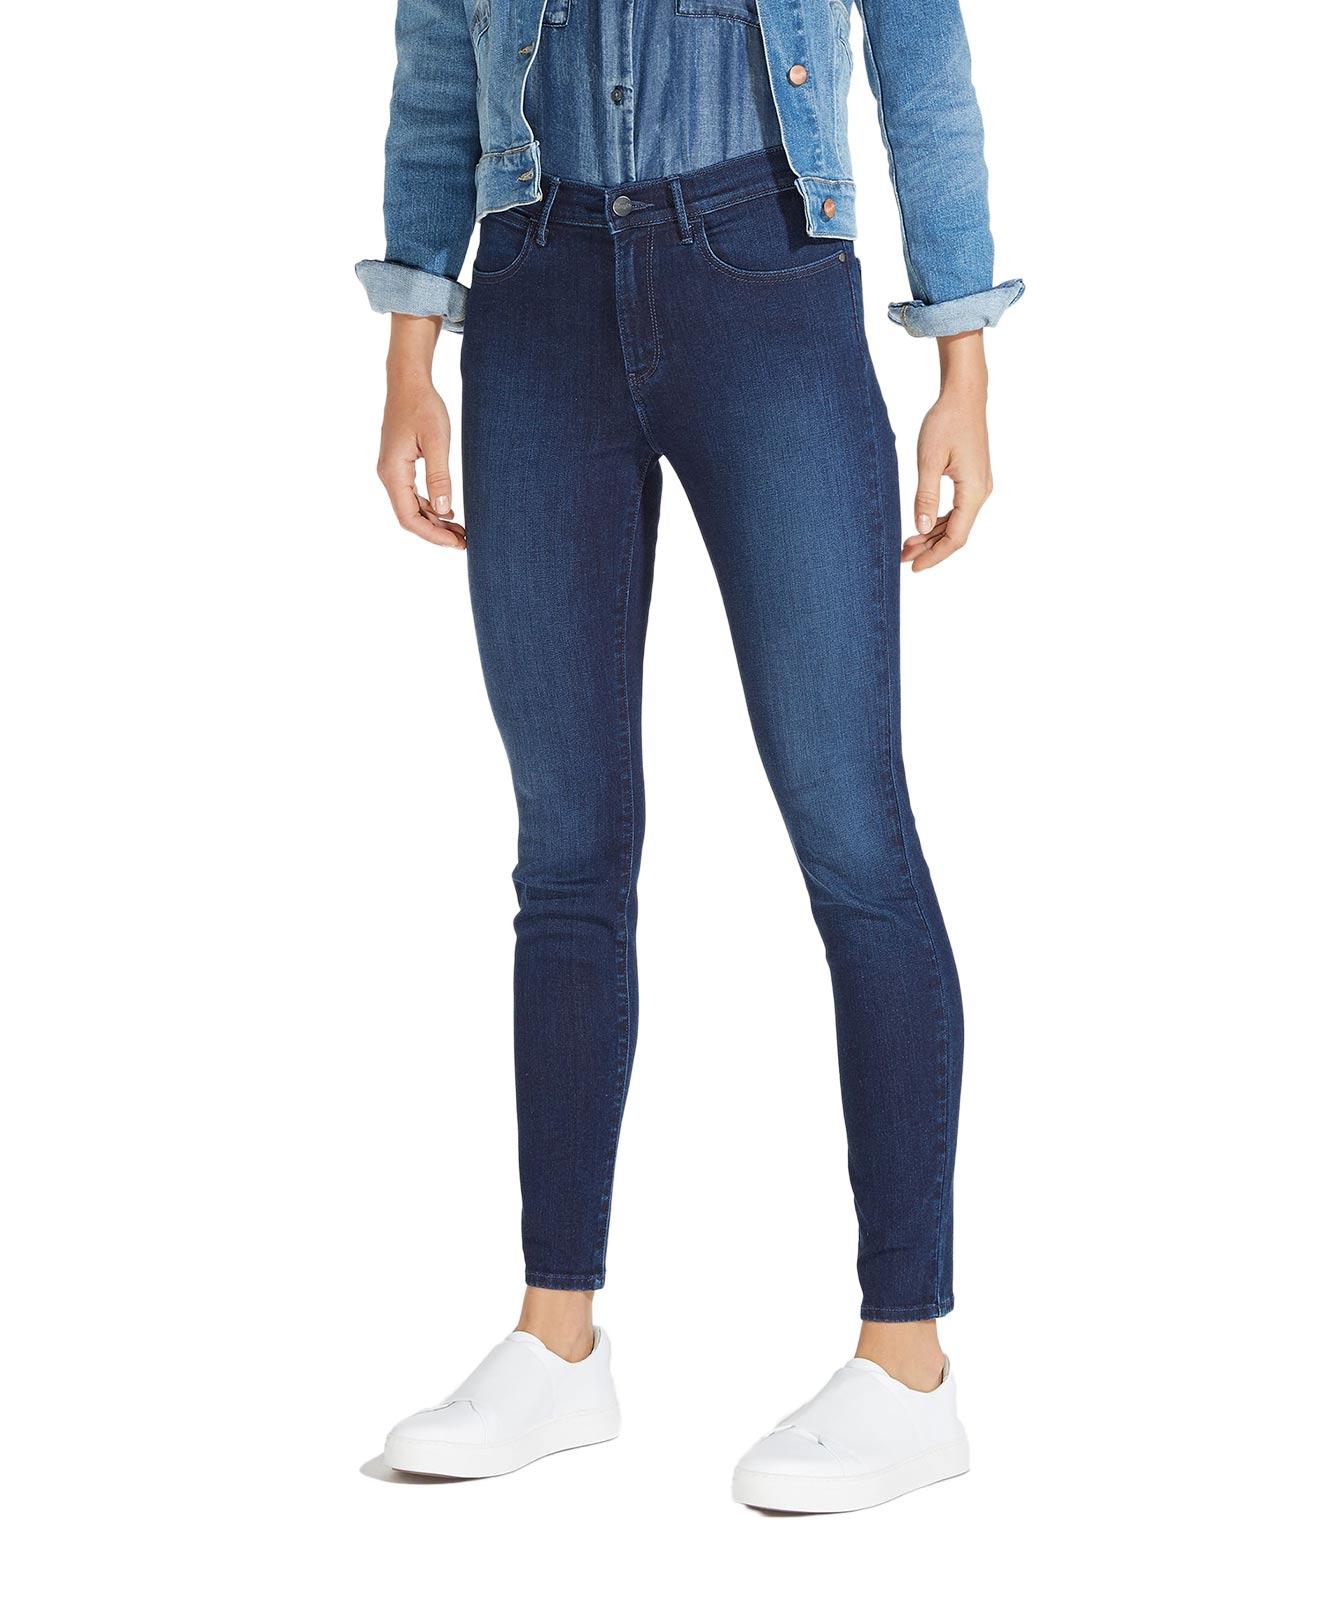 Hosen für Frauen - WRANGLER HIGH RISE SKINNY Jeans Subtle Blue  - Onlineshop Jeans Meile